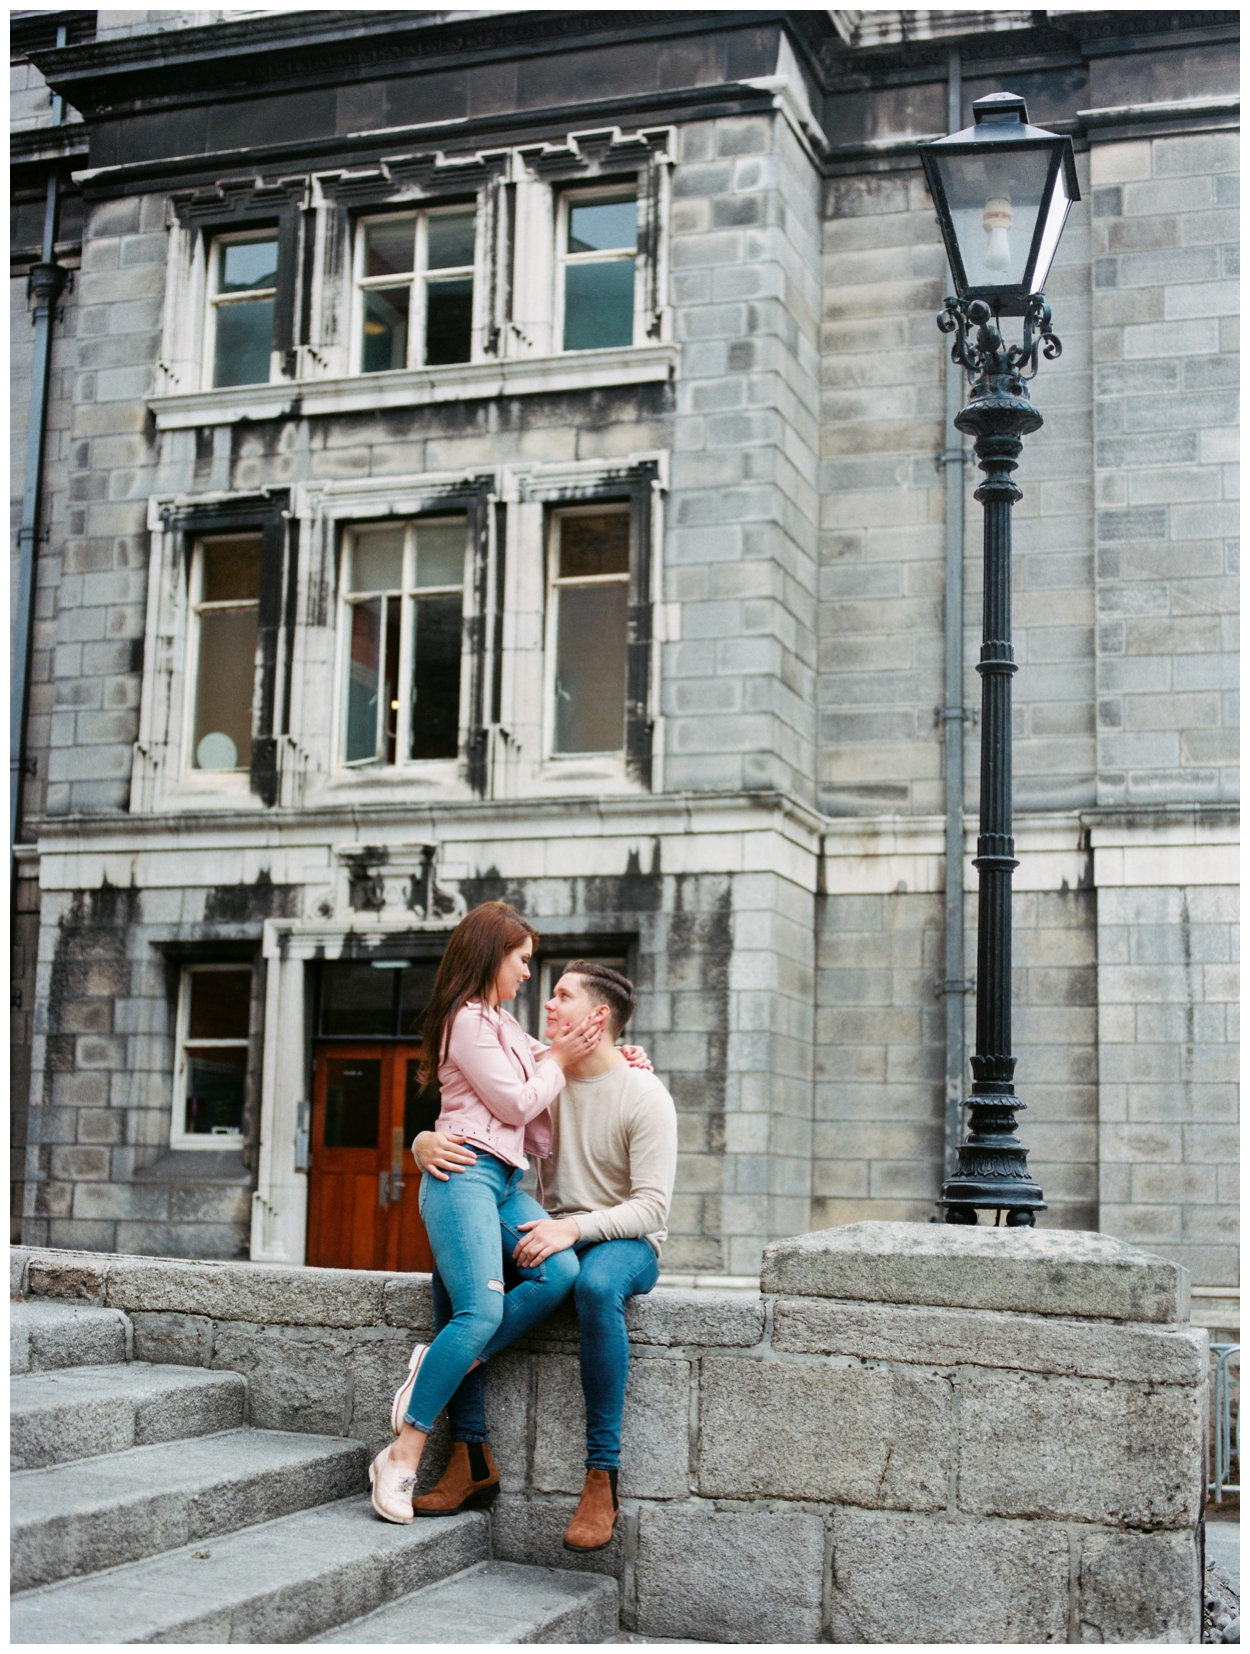 couple's anniversary photo session in Dublin Ireland on film by fine art photographer Lissa Ryan Photography